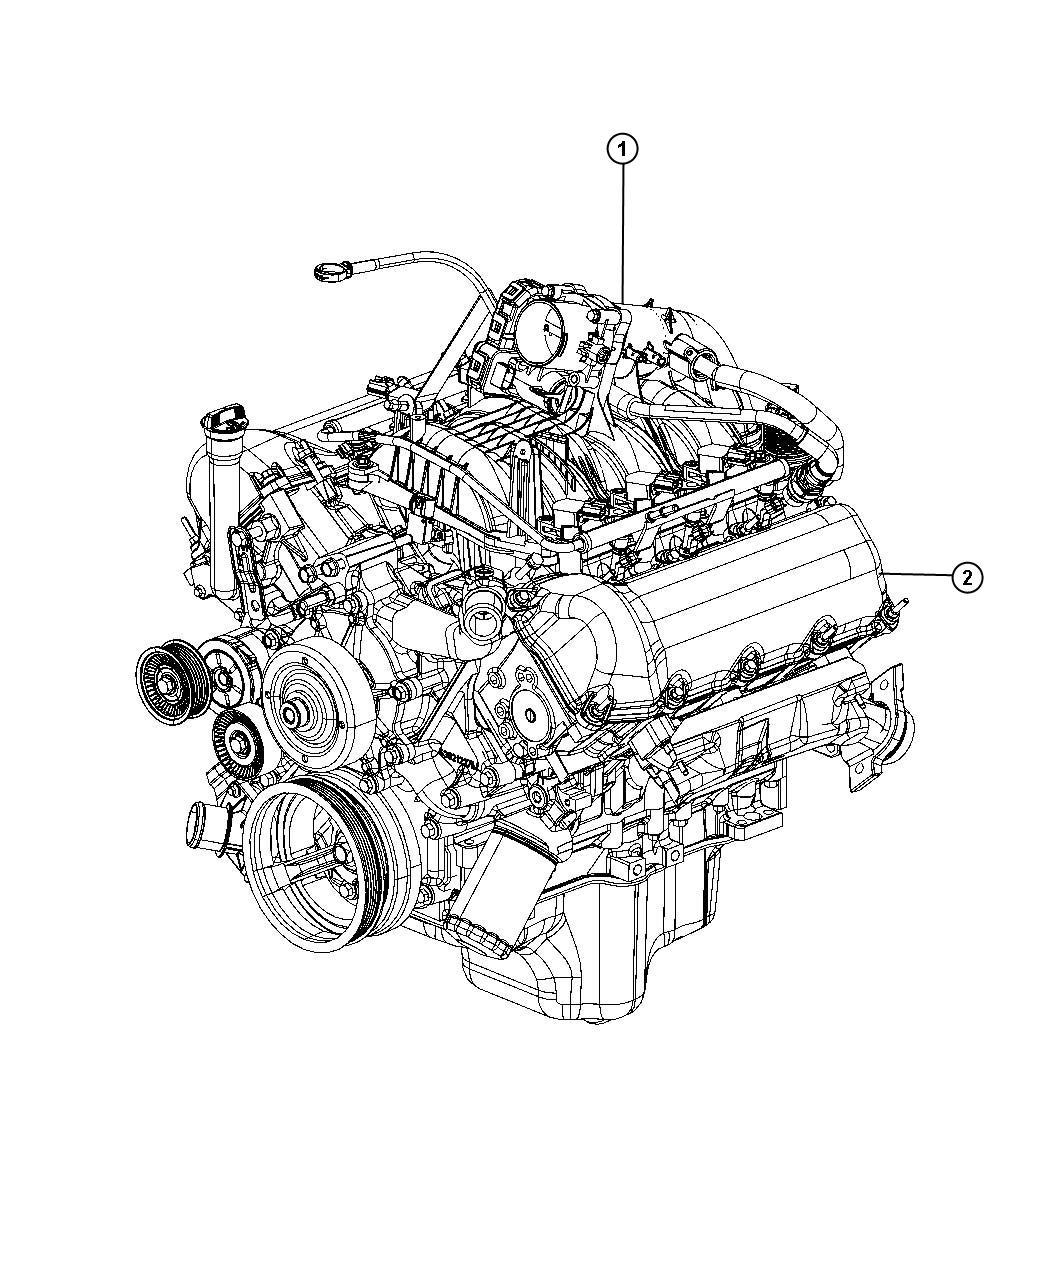 Dodge Nitro Engine Long Block Remanufactured